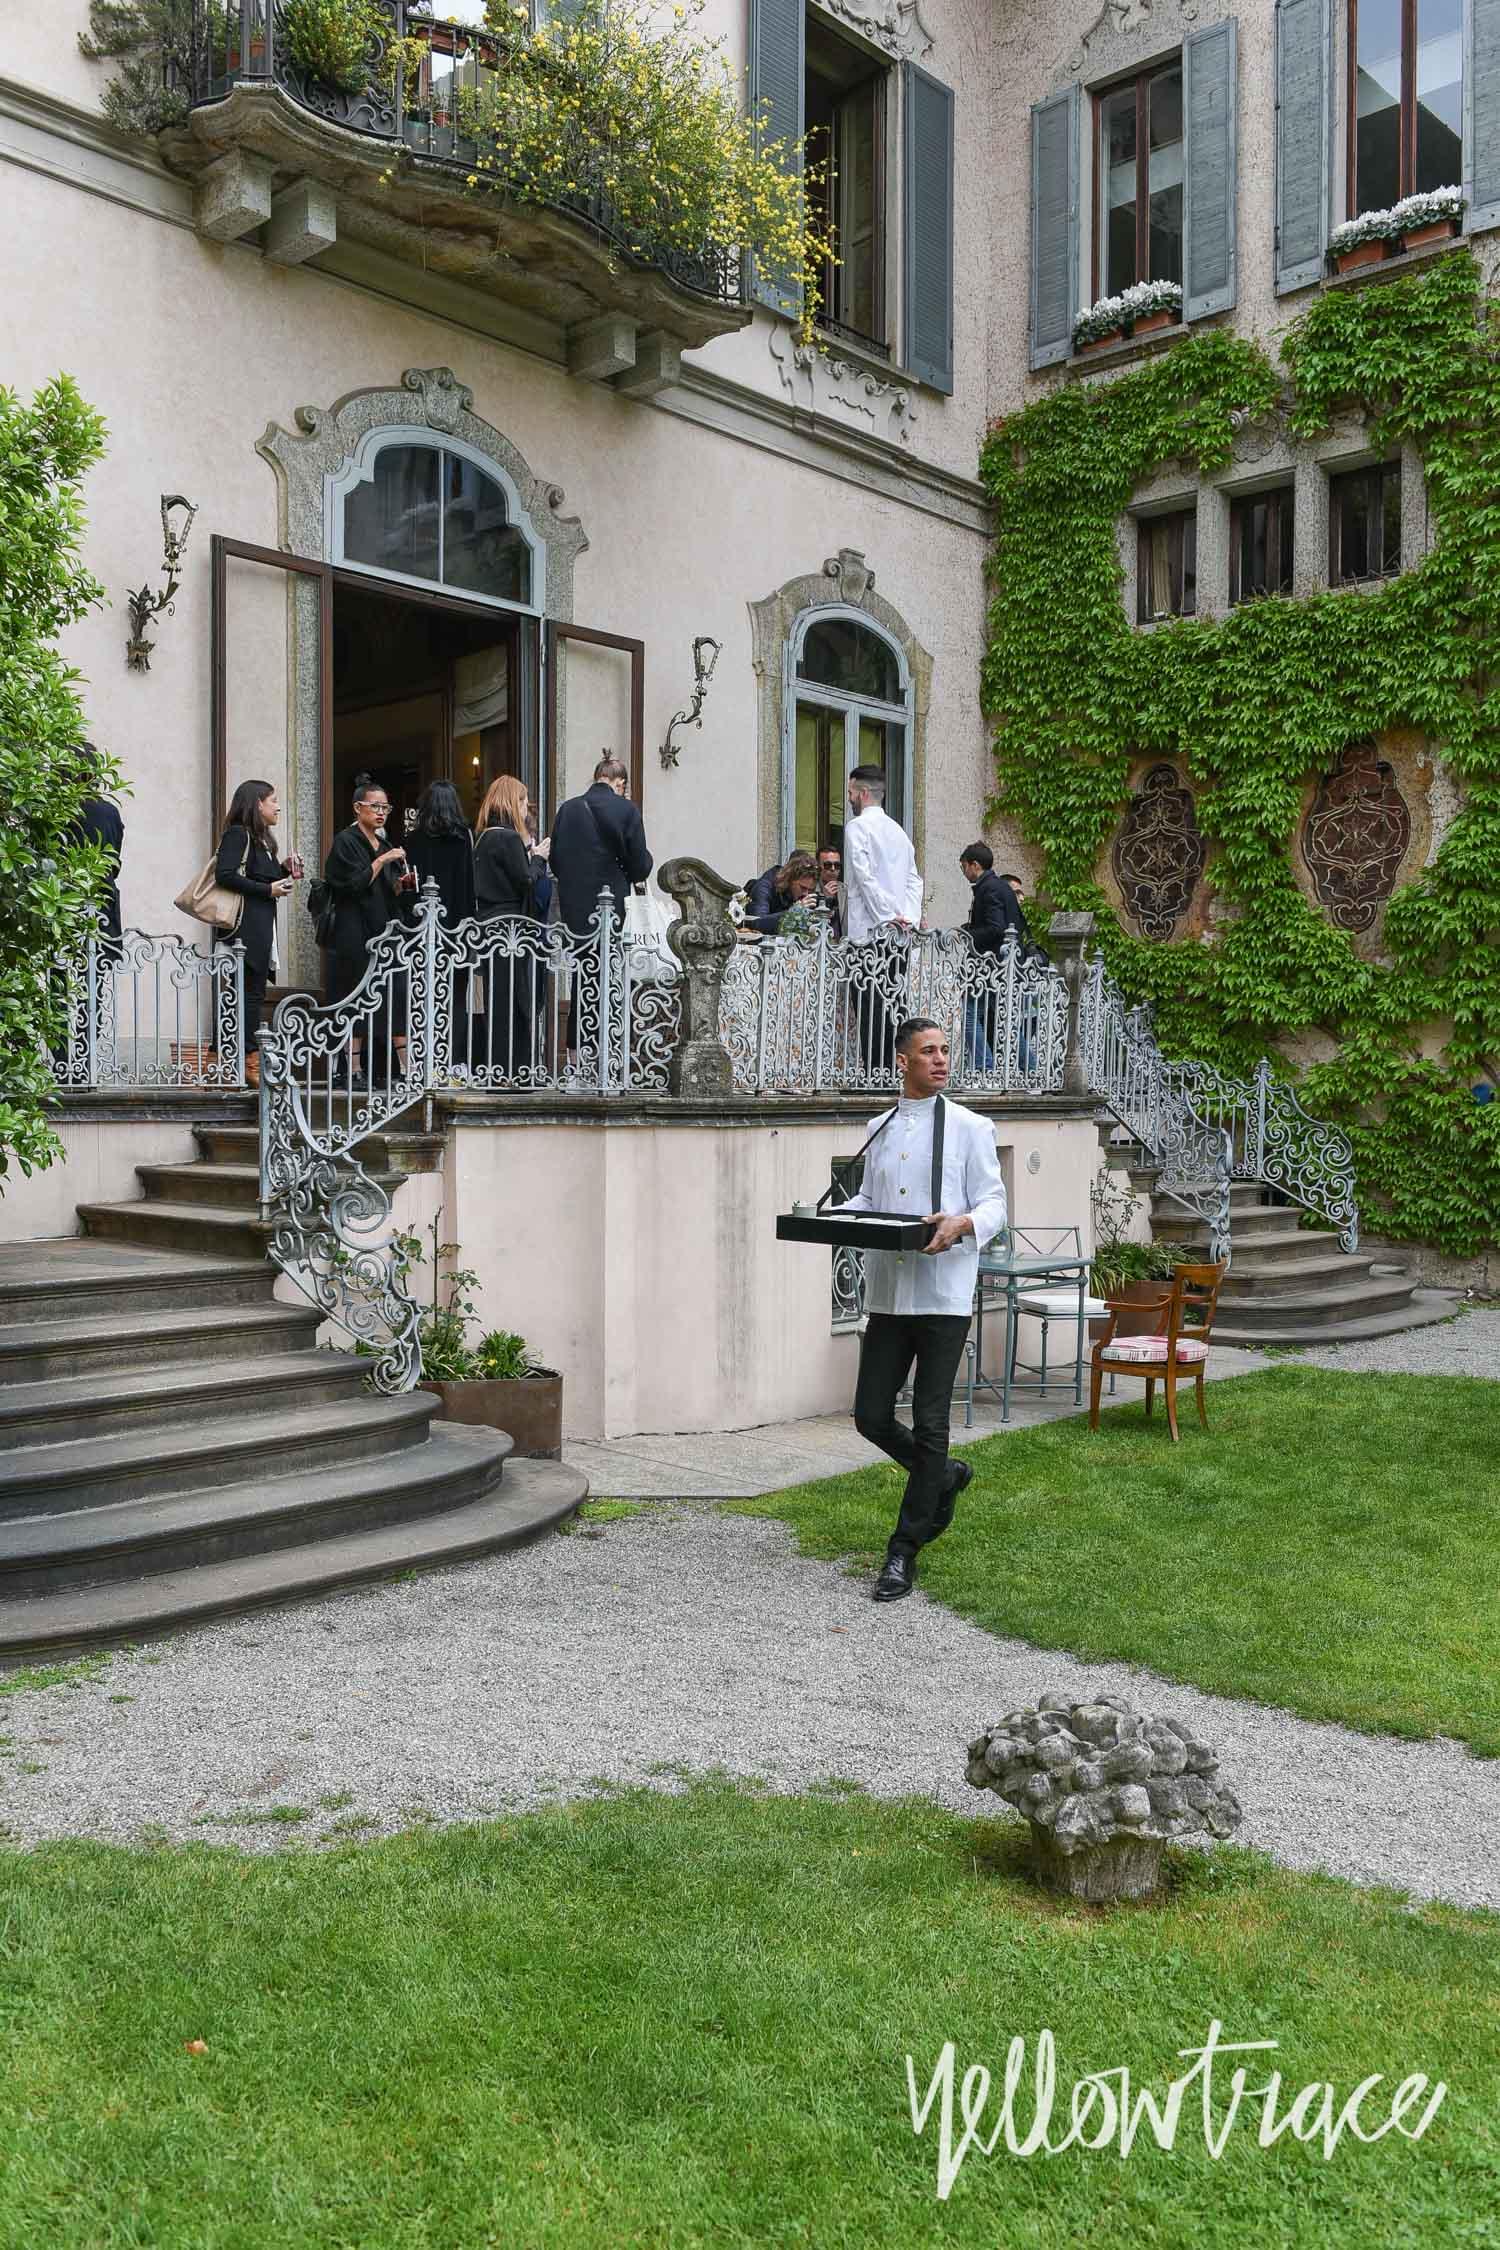 Milan Design Week 2017 Highlights, Airbnb 'Passeggiata' at Casa degli Atellani, Photo © Nick Hughes | #Milantrace2017